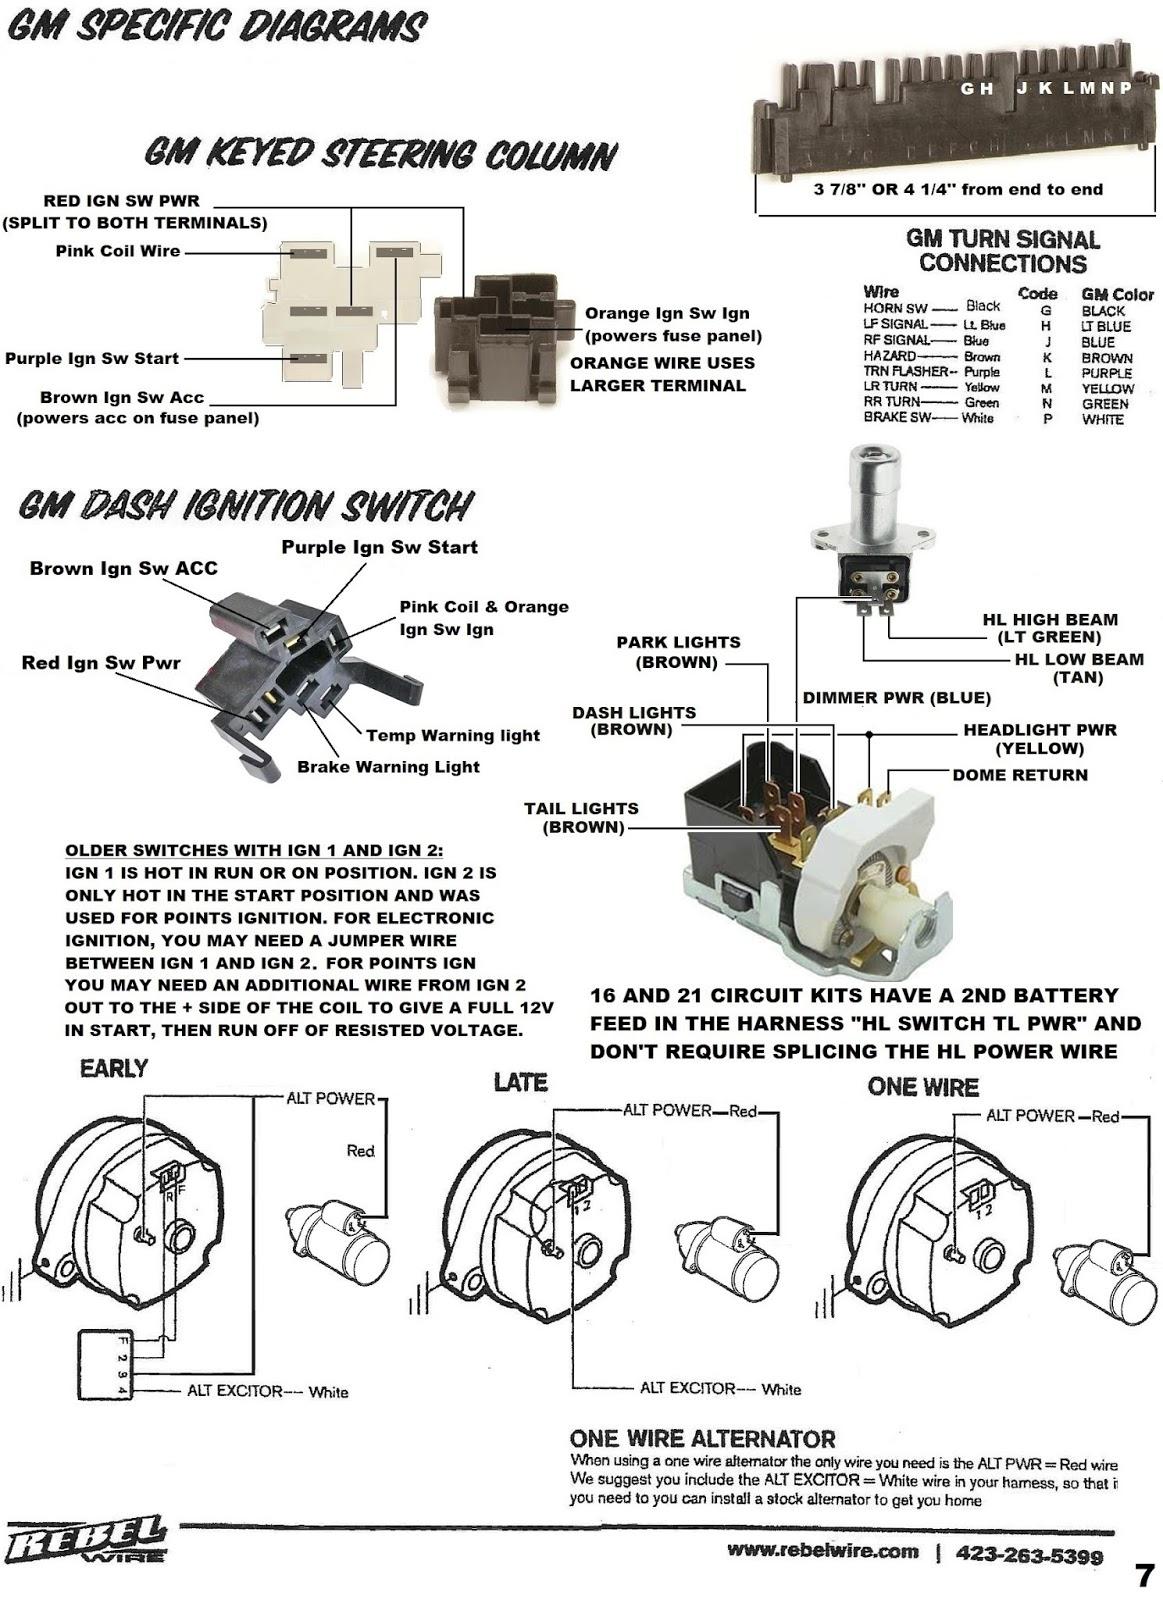 ww_1421] gm steering column wiring diagram schematic wiring  ittab licuk bupi xortanet mohammedshrine librar wiring 101